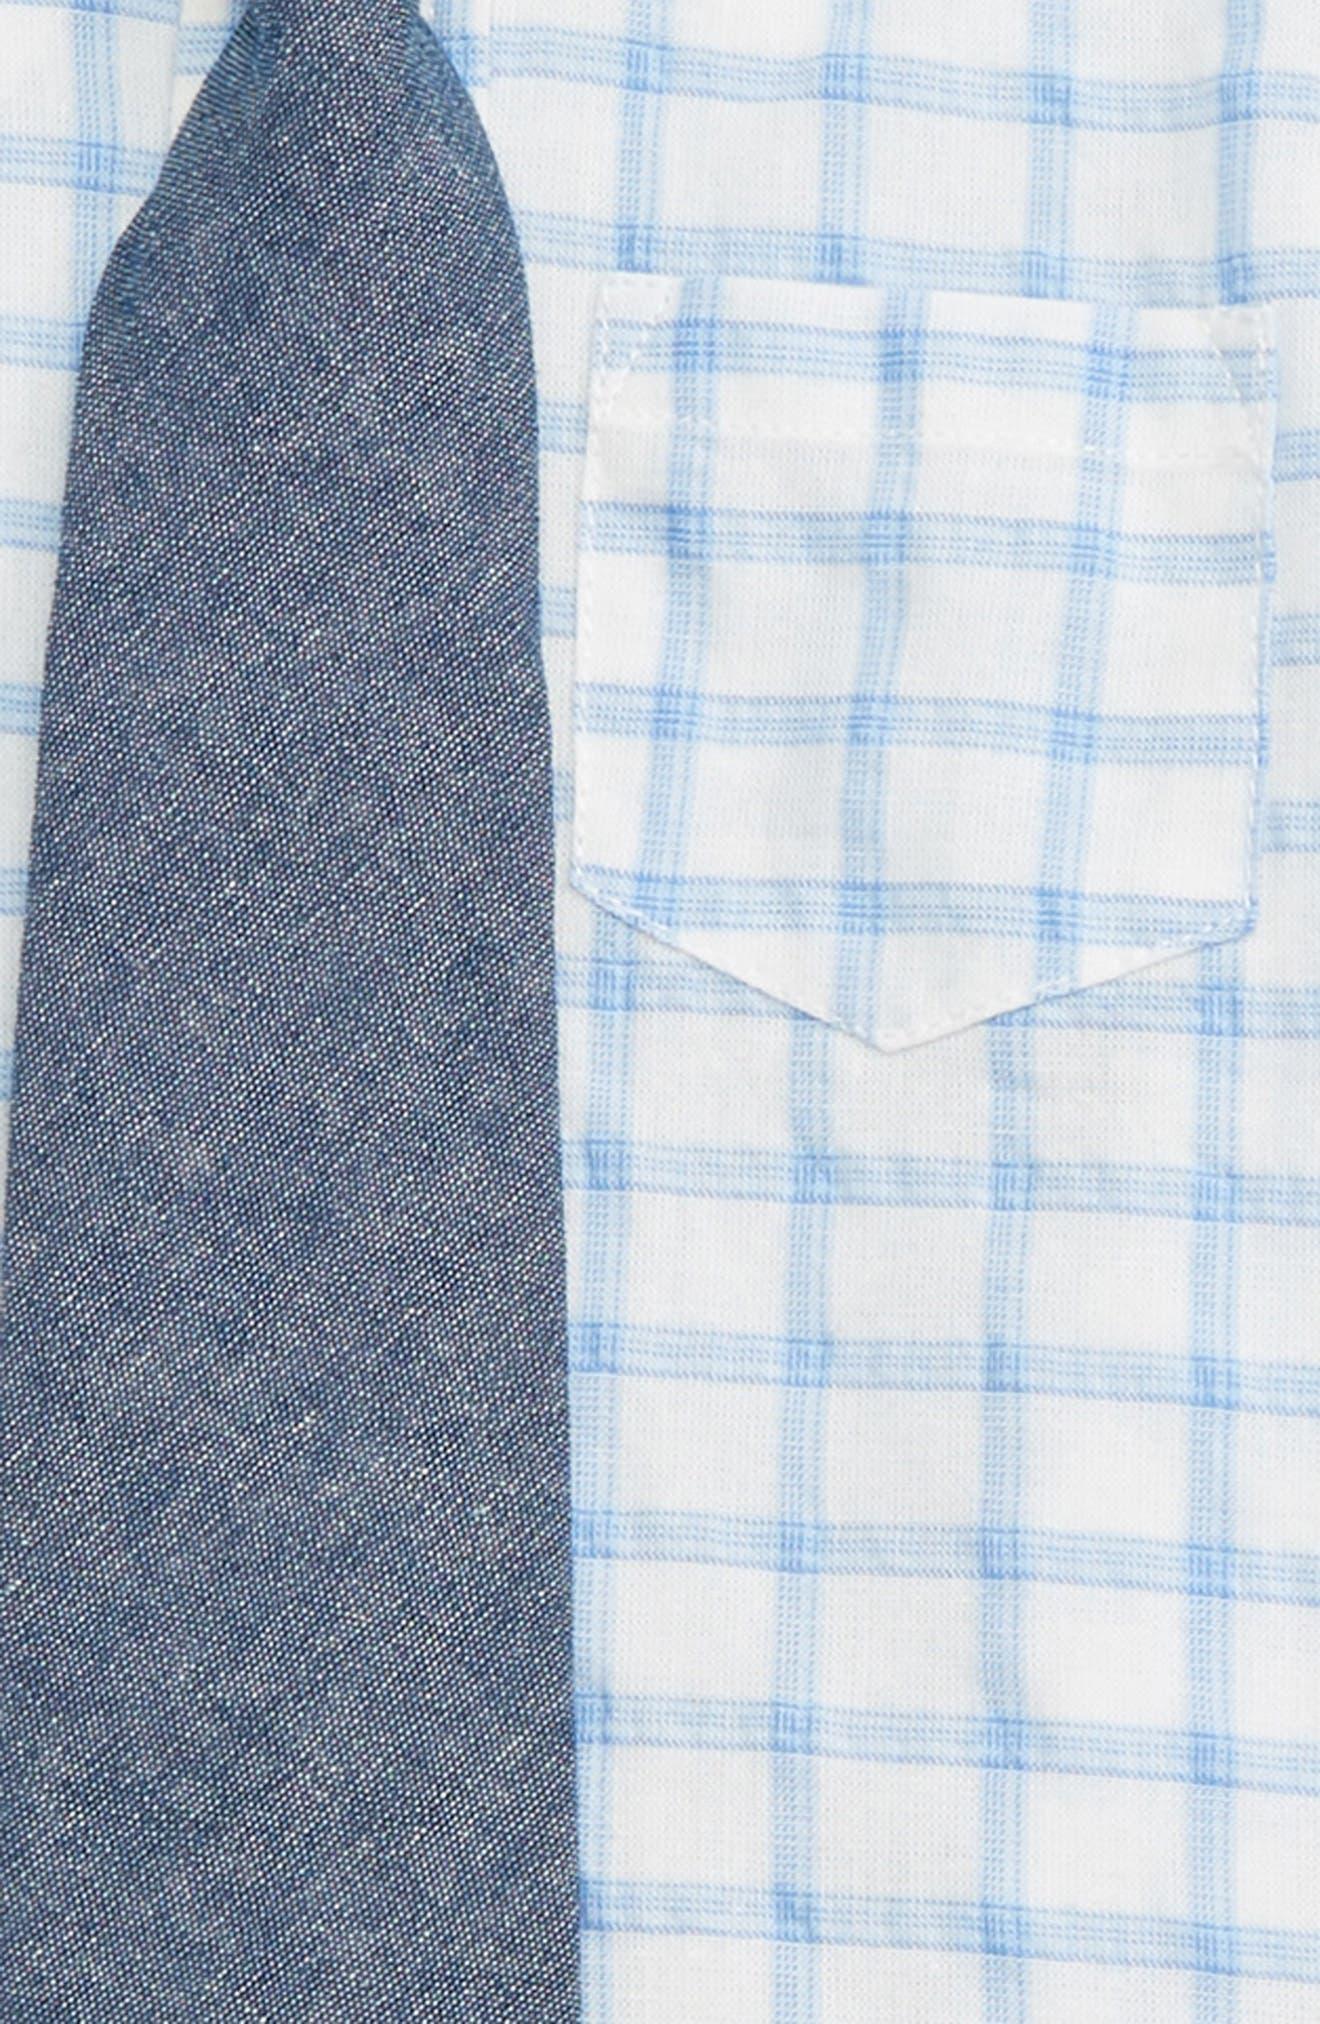 LITTLE ME, Tattersall Plaid Shirt, Pants & Tie Set, Alternate thumbnail 2, color, 250